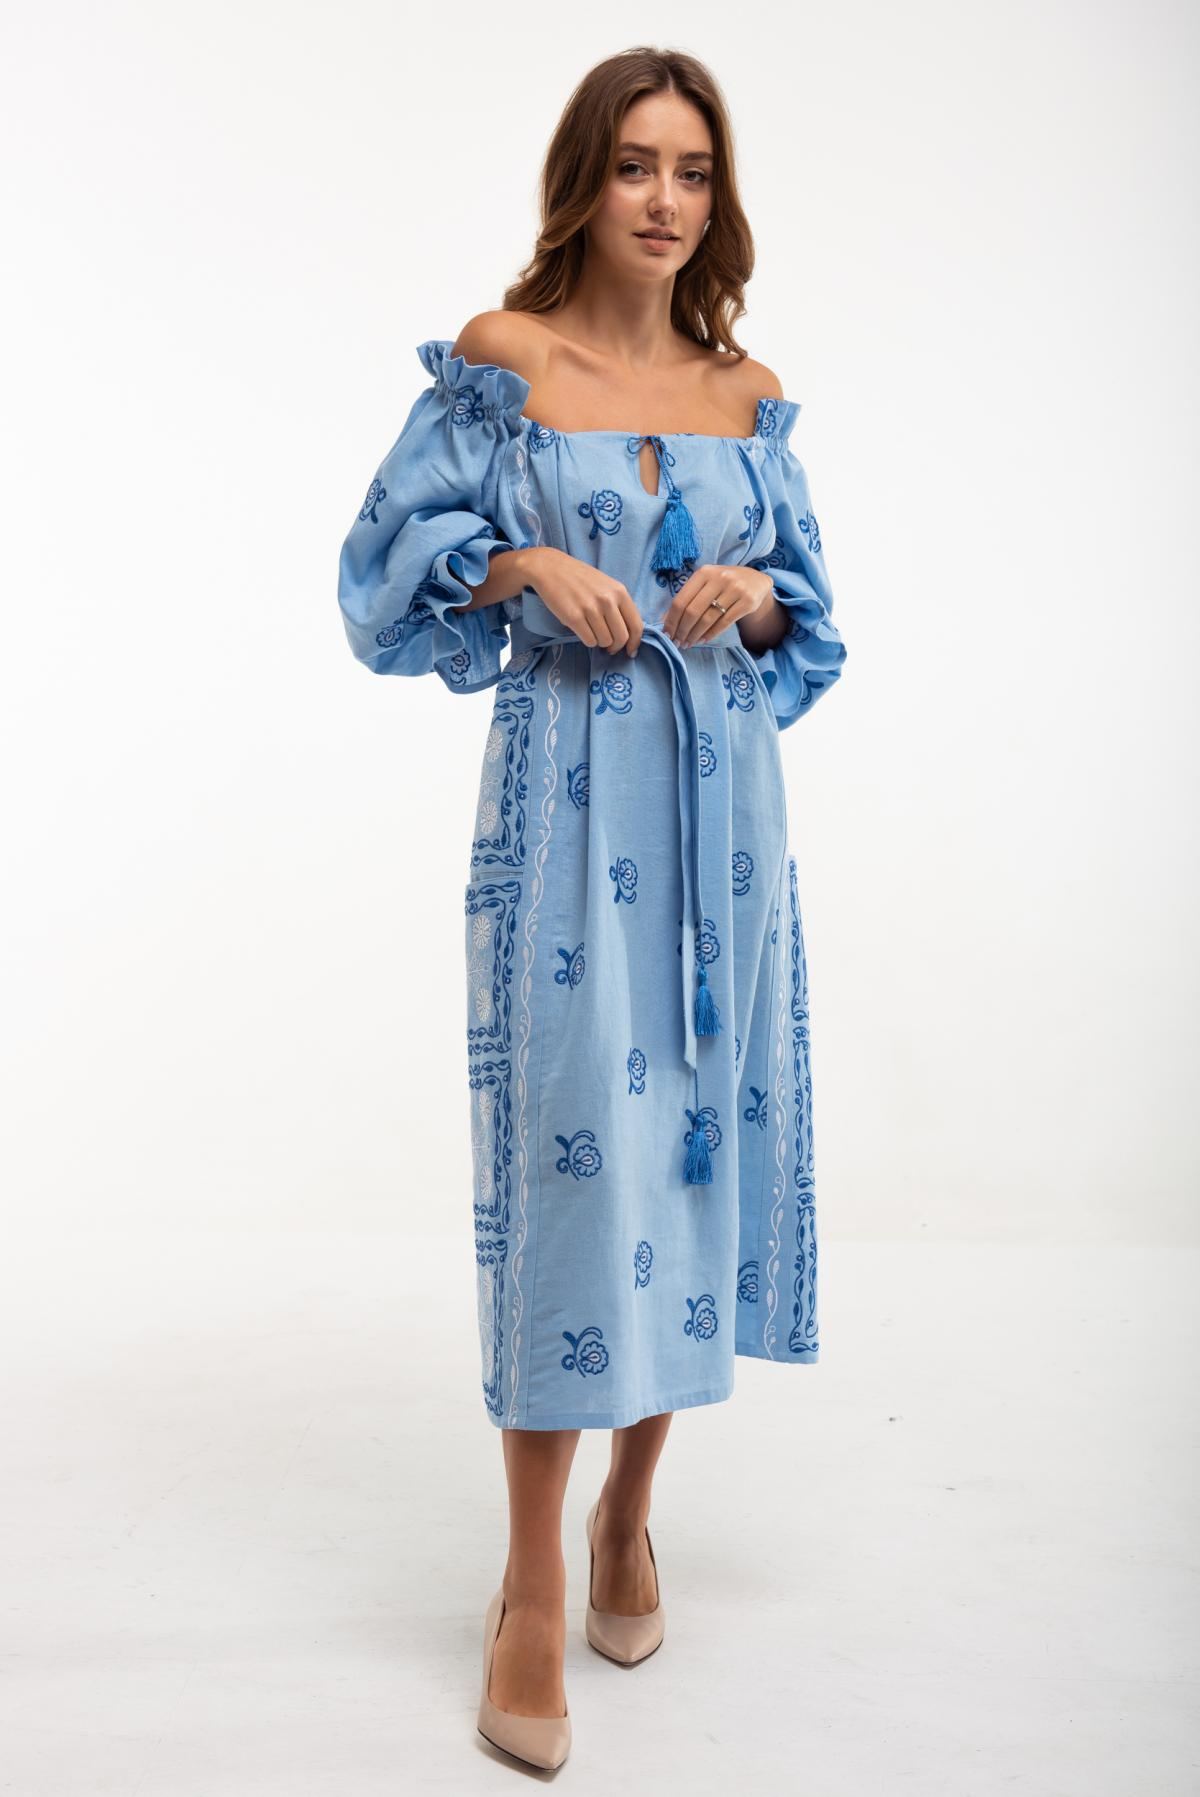 Embroidered dress Barvinok blue. Photo №1. | Narodnyi dim Ukraine